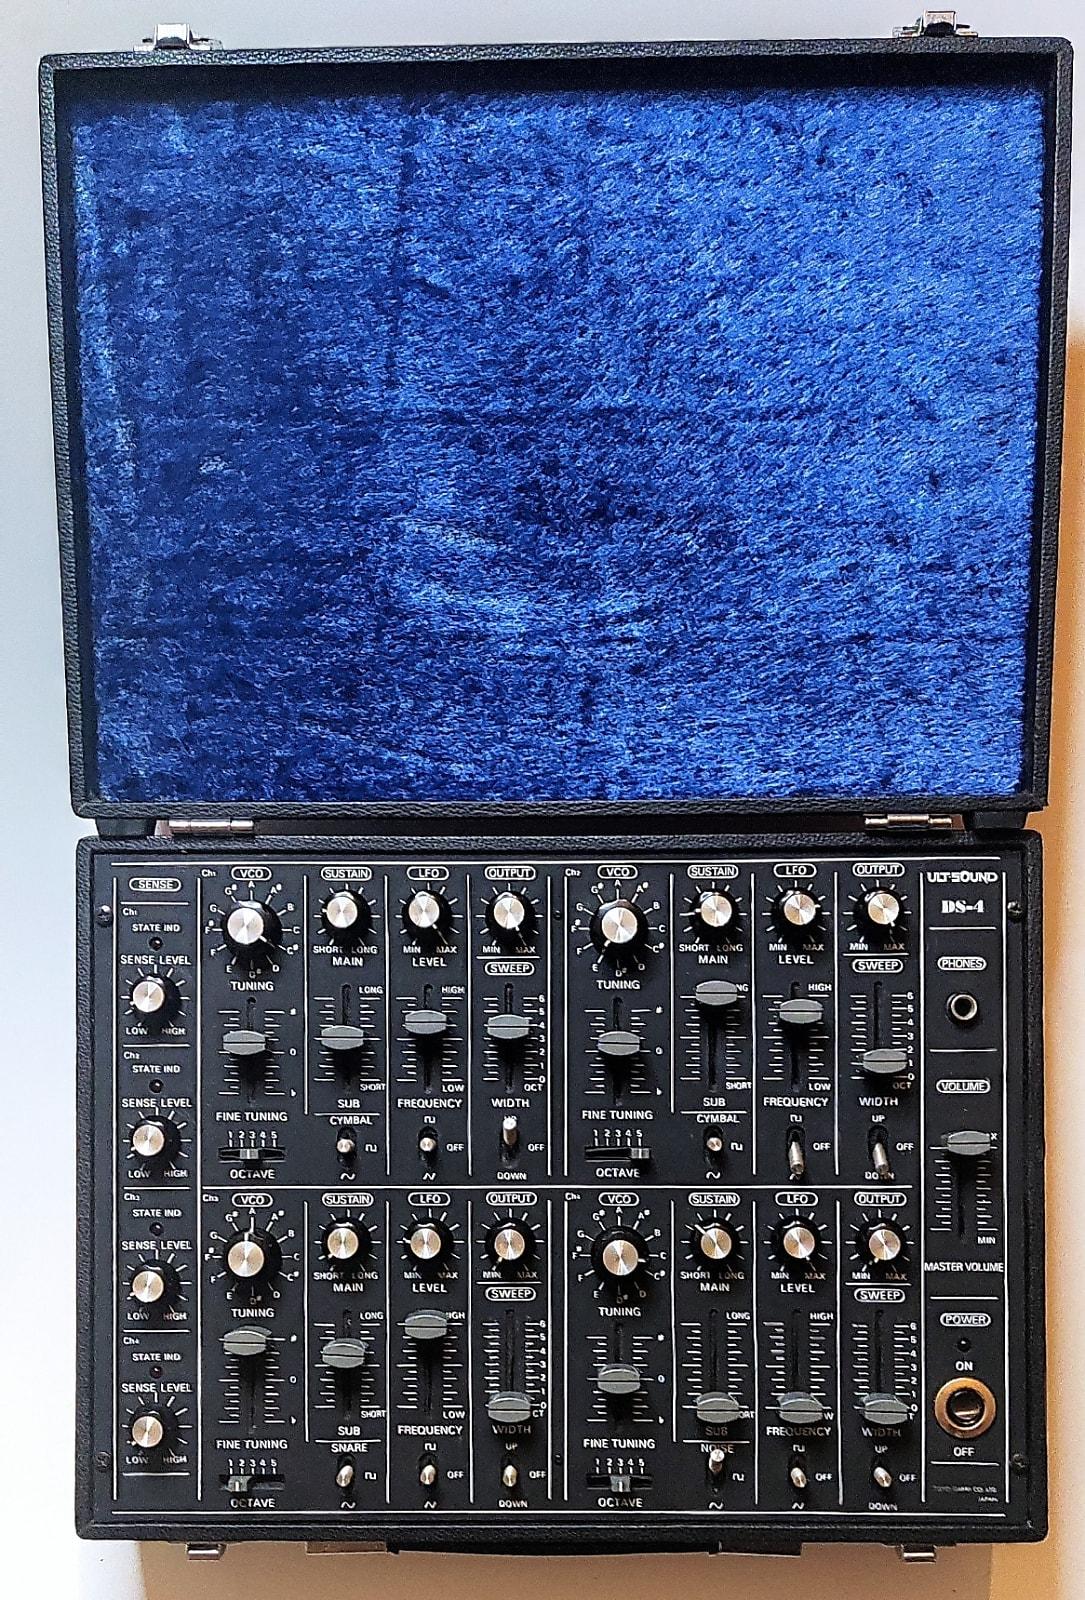 ULT-Sound DS-4